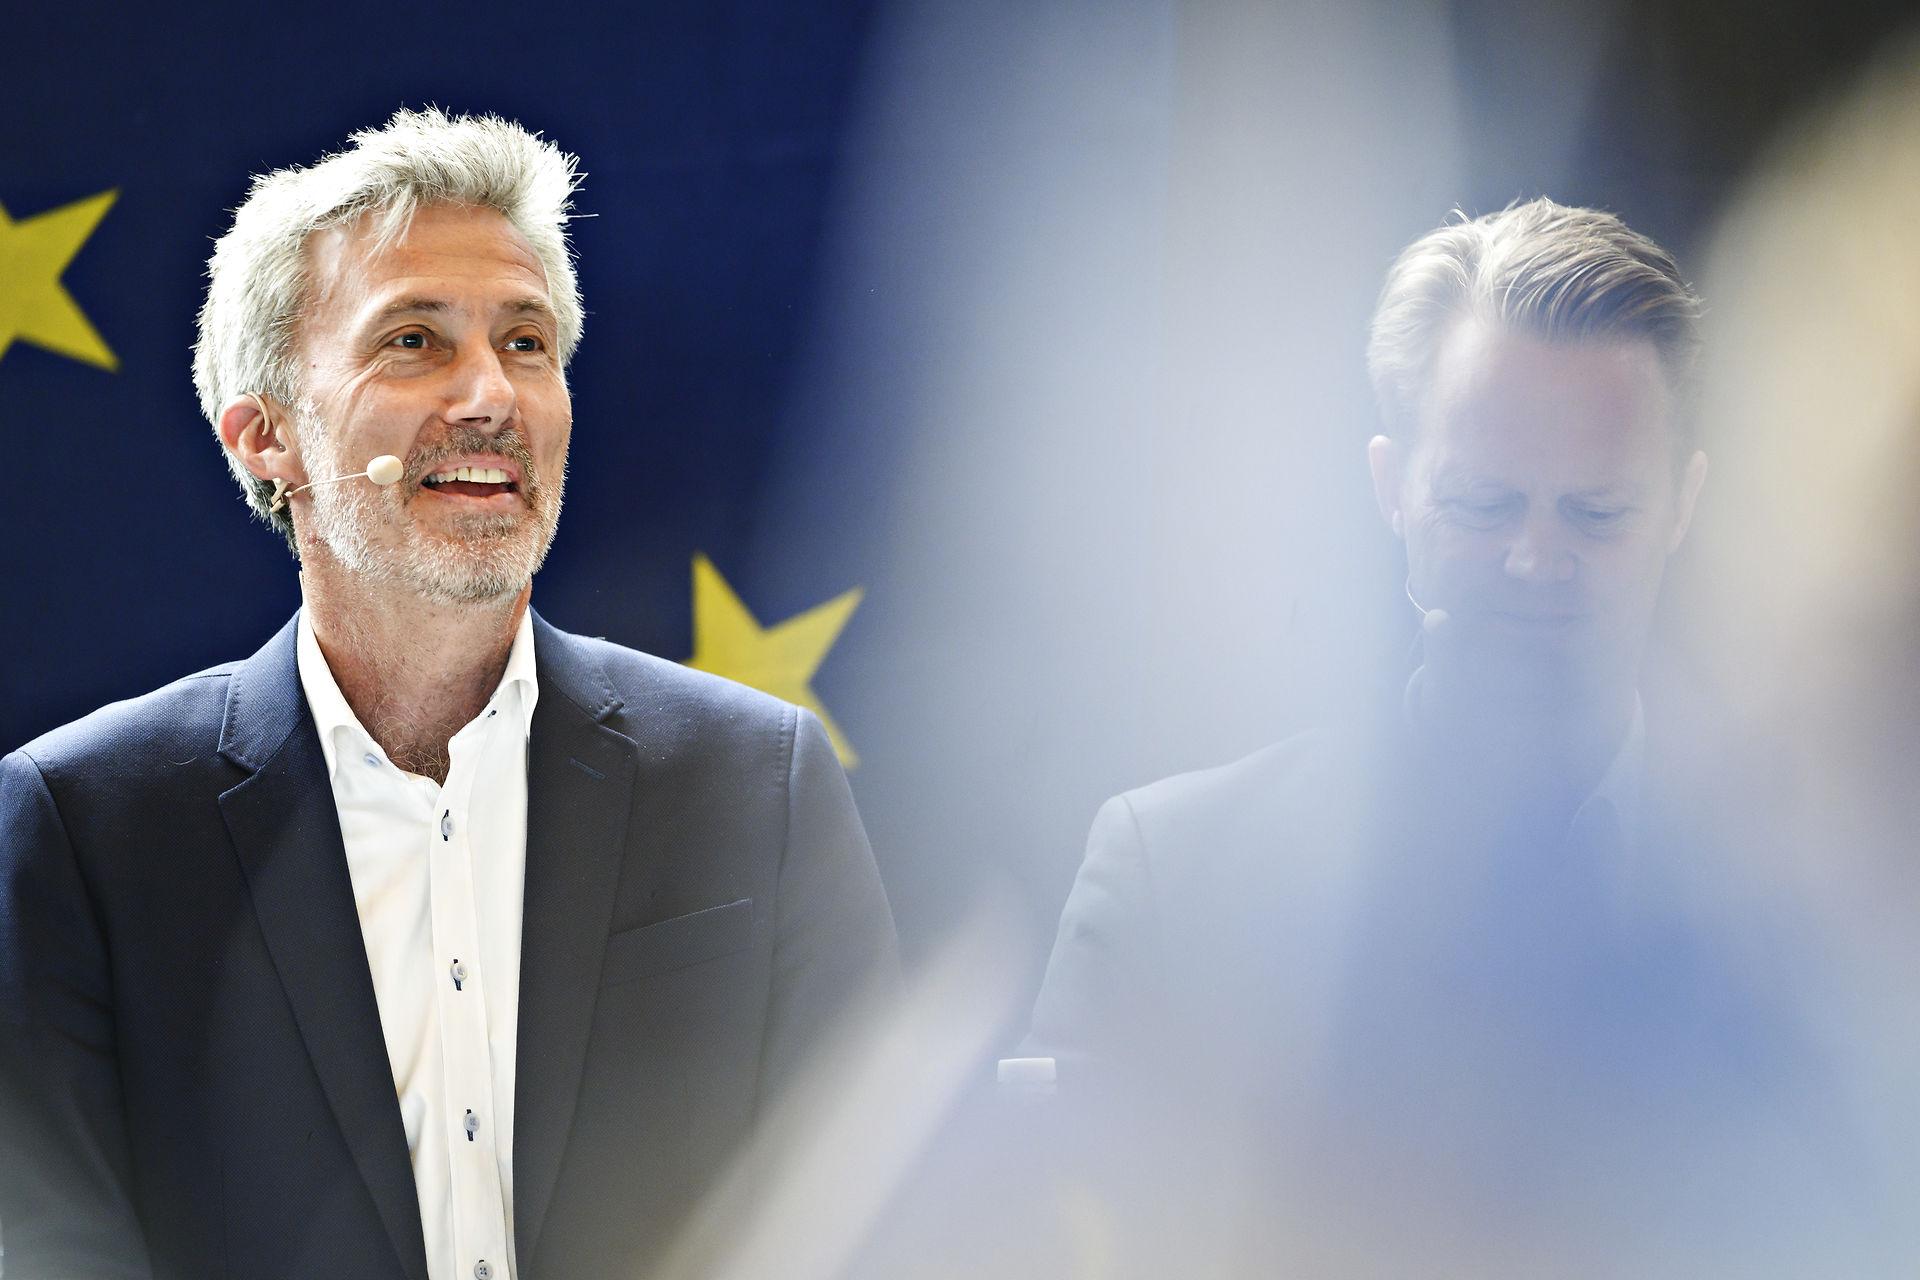 Politikere i opråb: EU skal redde medier i corona-krise